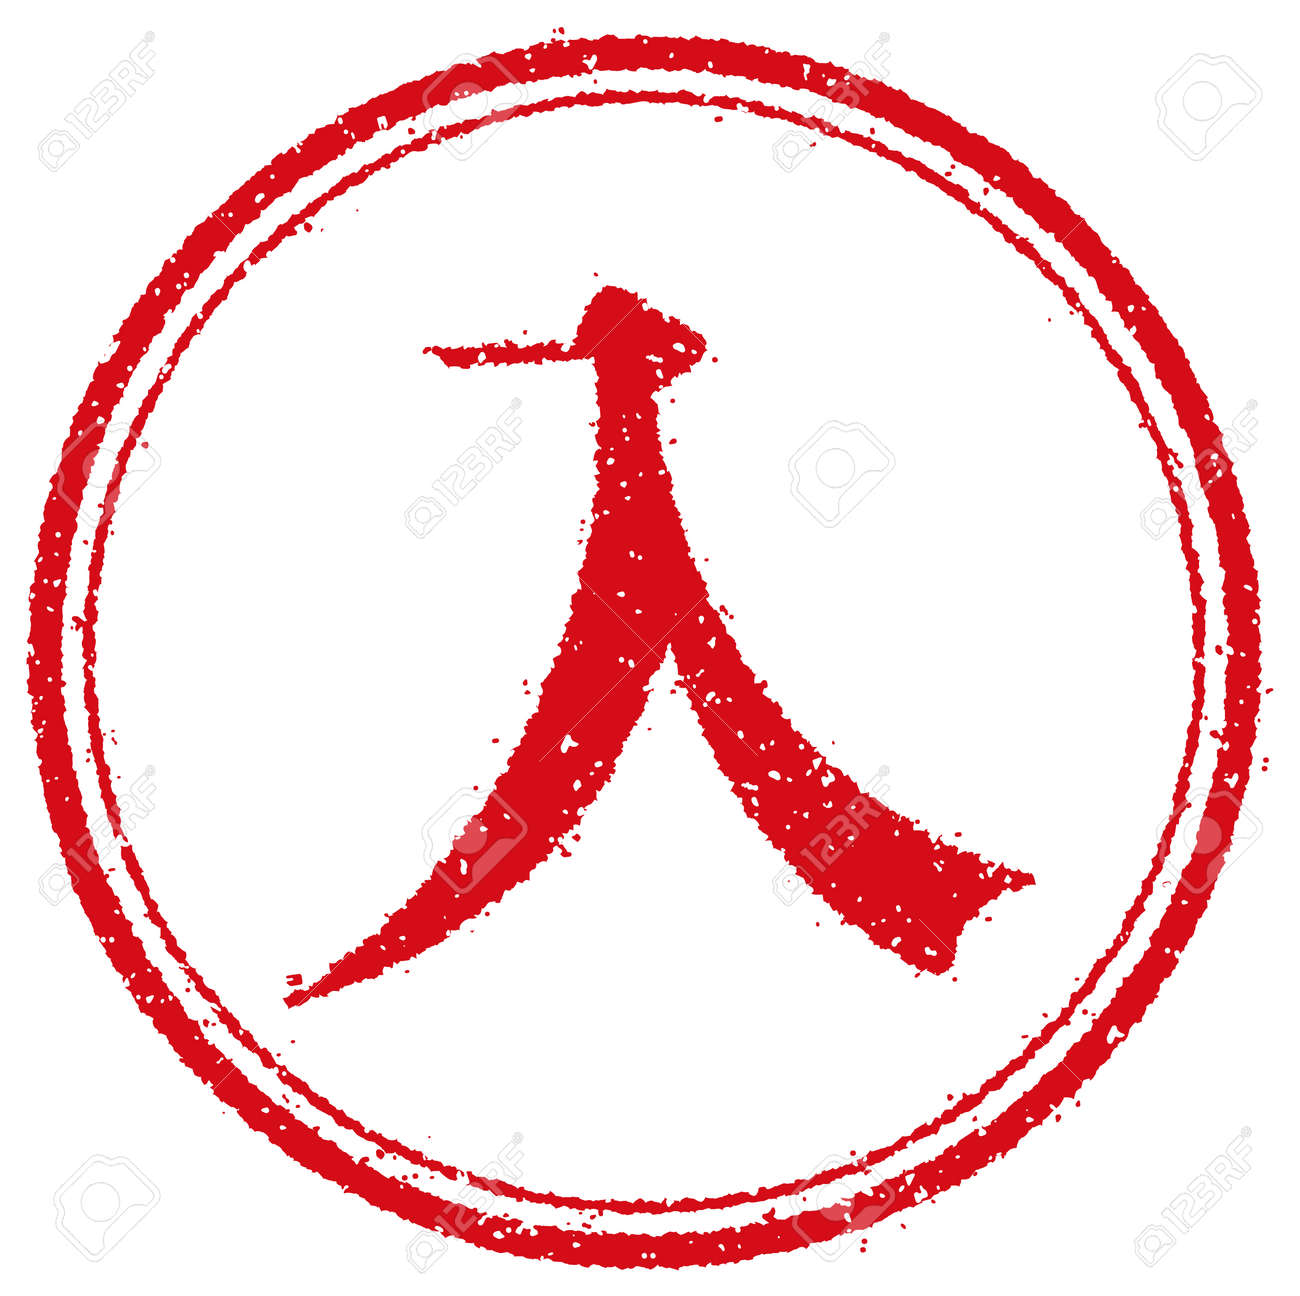 Rubber stamp illustration for Japanese business | entry, enter - 168732365